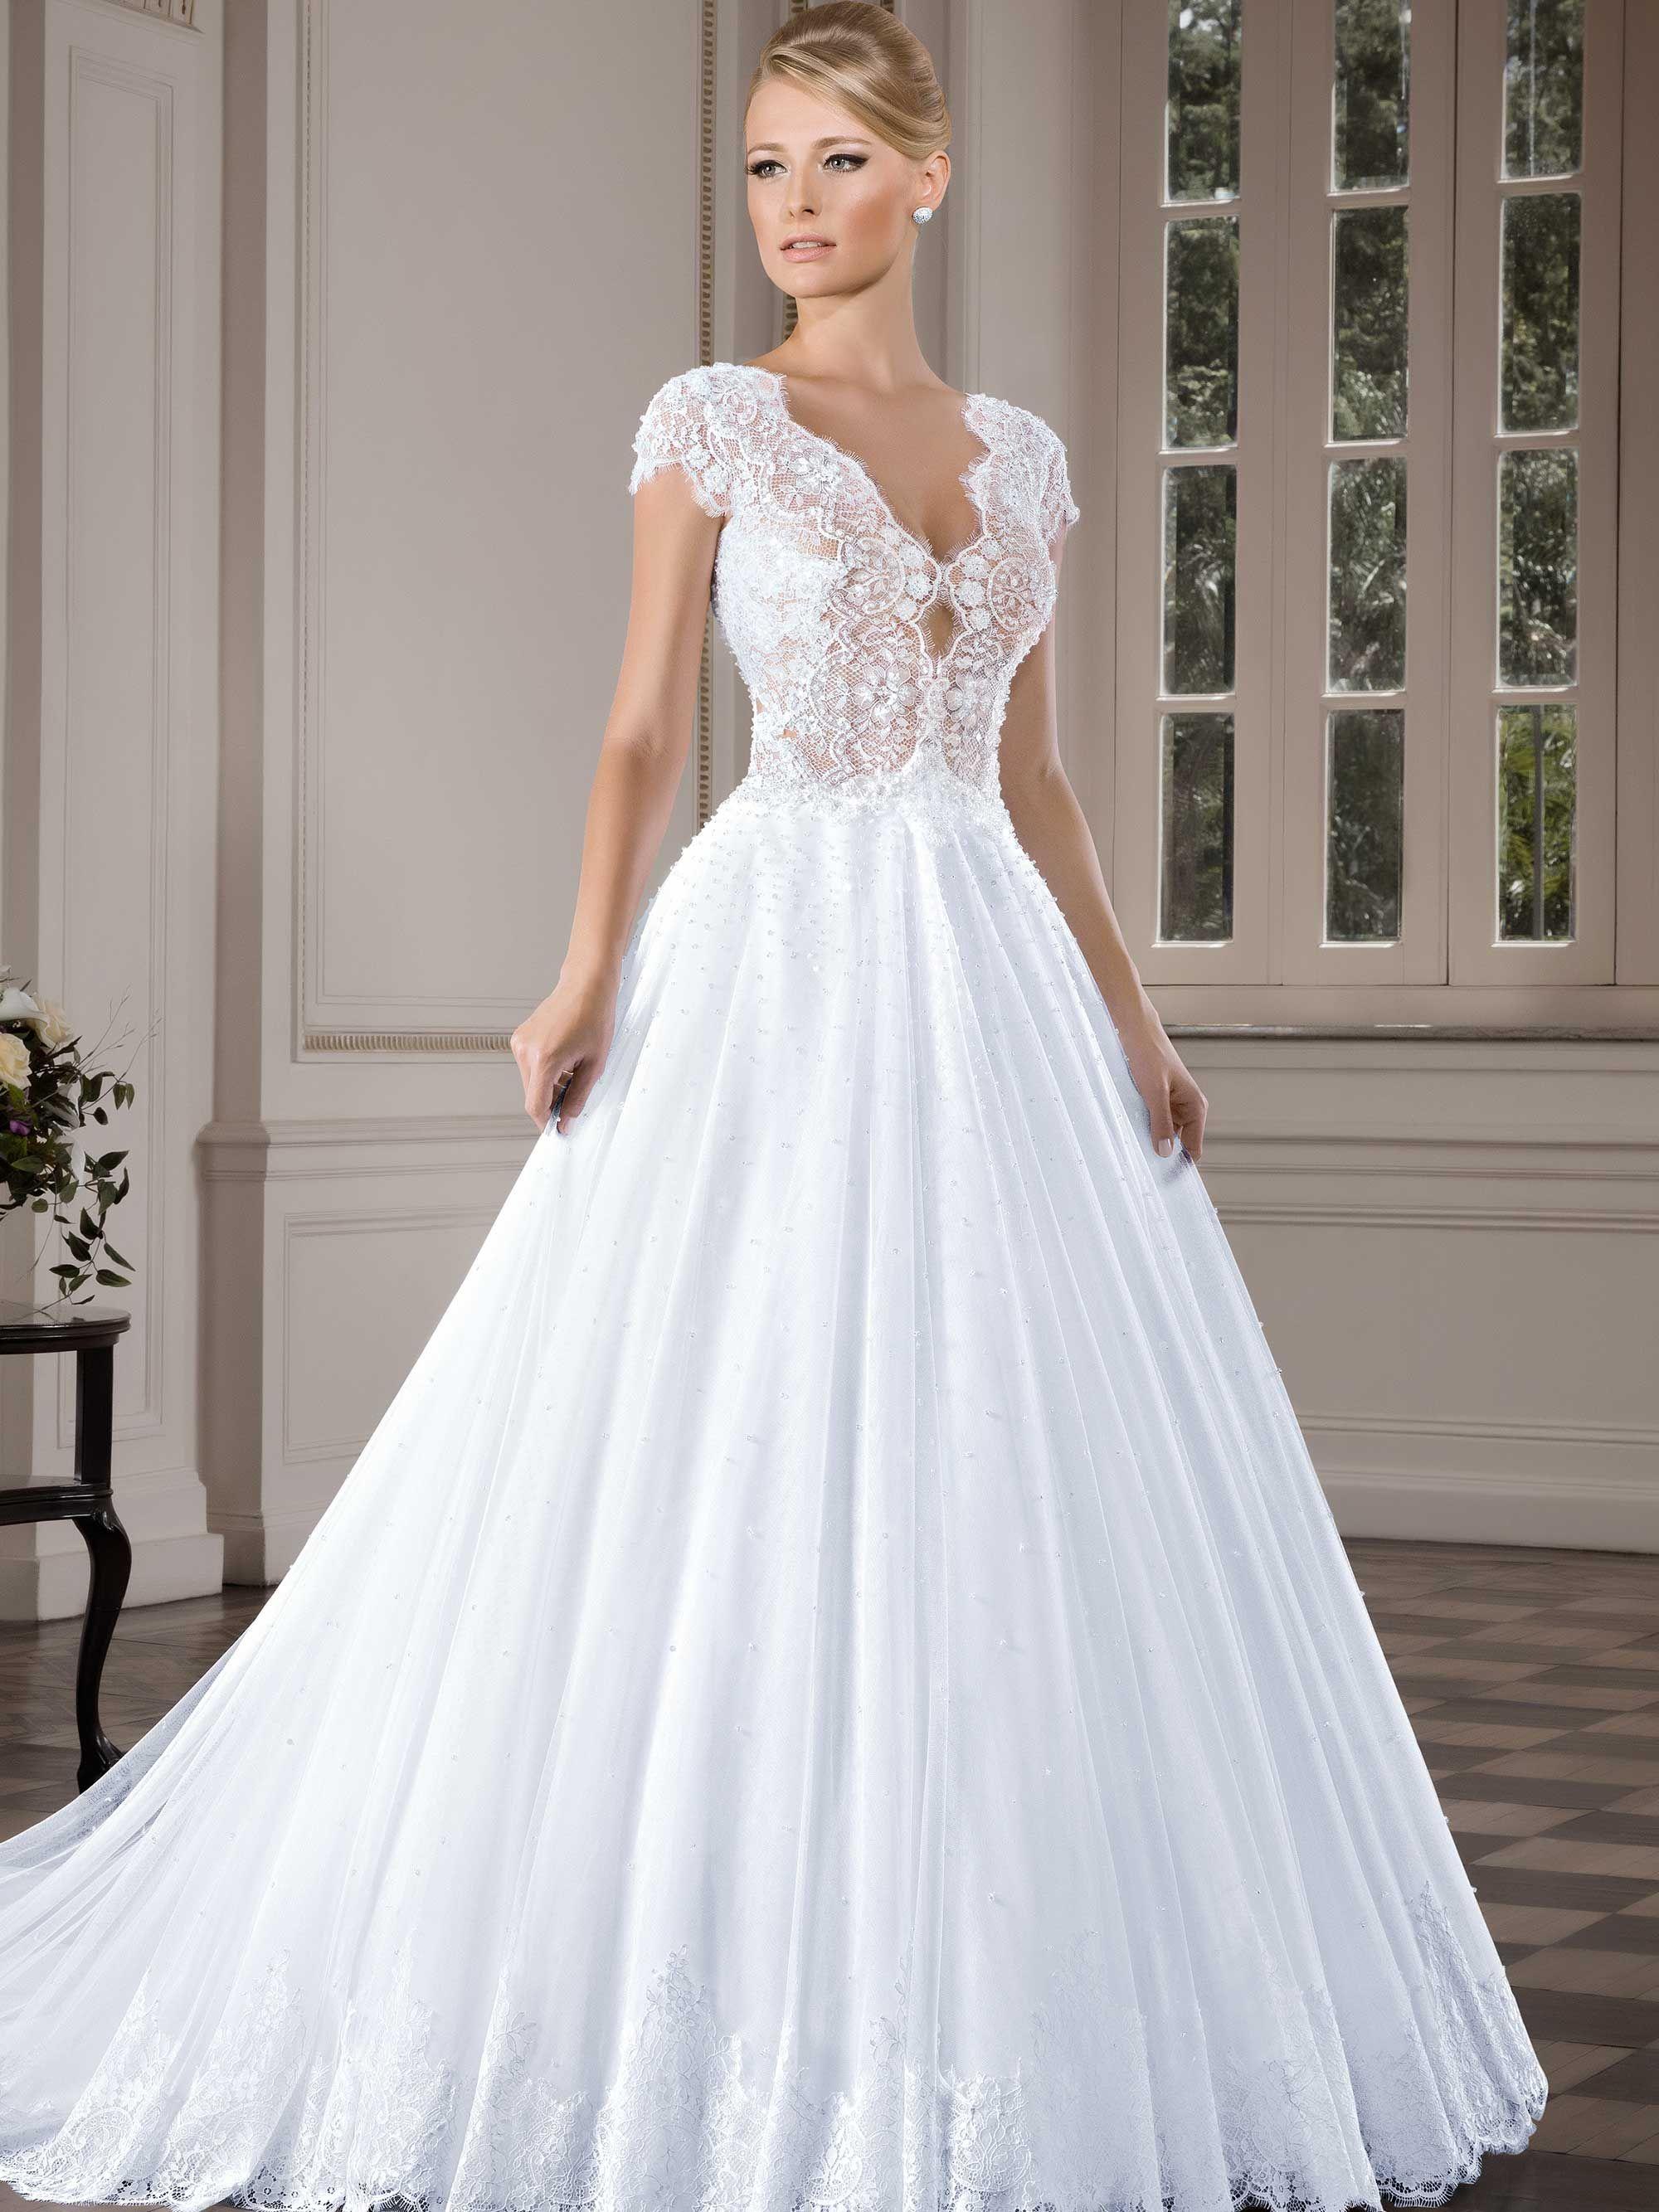 Conhe a mais sobre esta cole o de vestidos de noiva for Wedding dresses in delaware